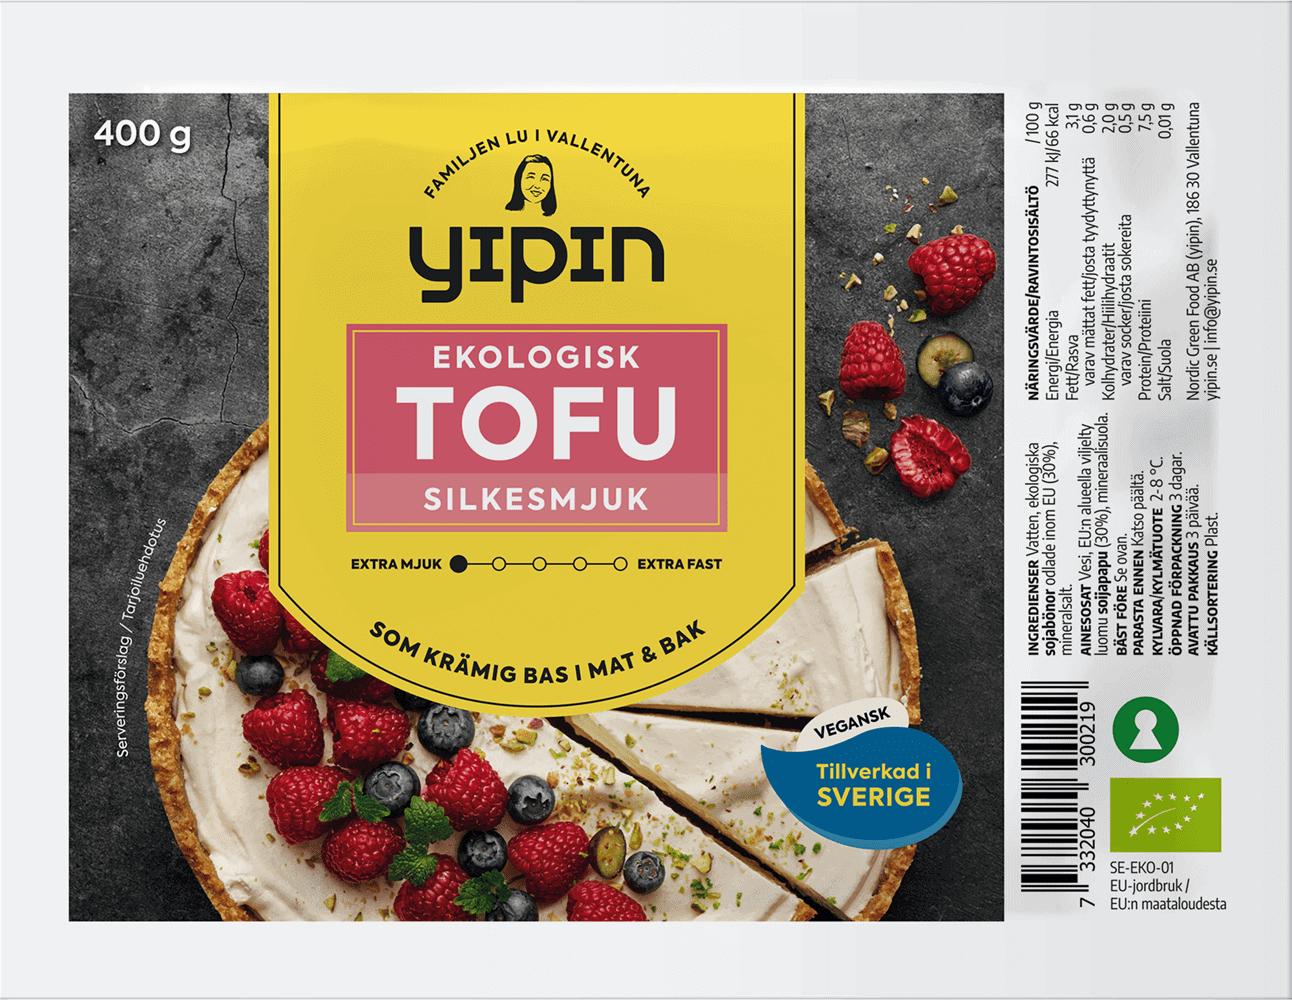 YiPin Tofu Silkesmjuk Ekologisk 400g EKO Silkestofu